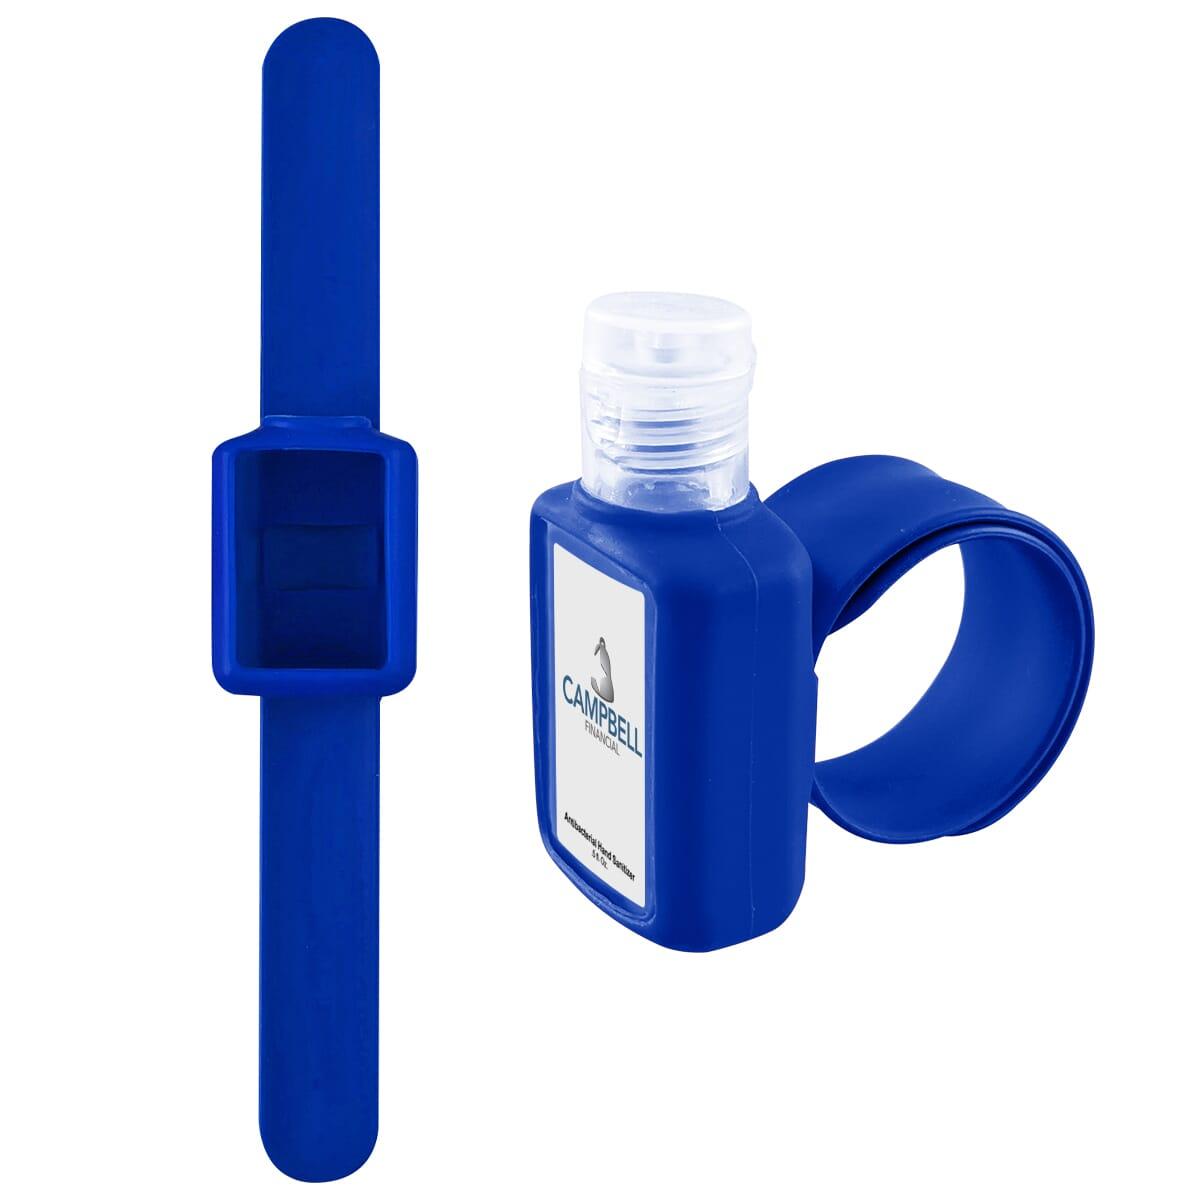 Hand sanitizer with slap bracelet